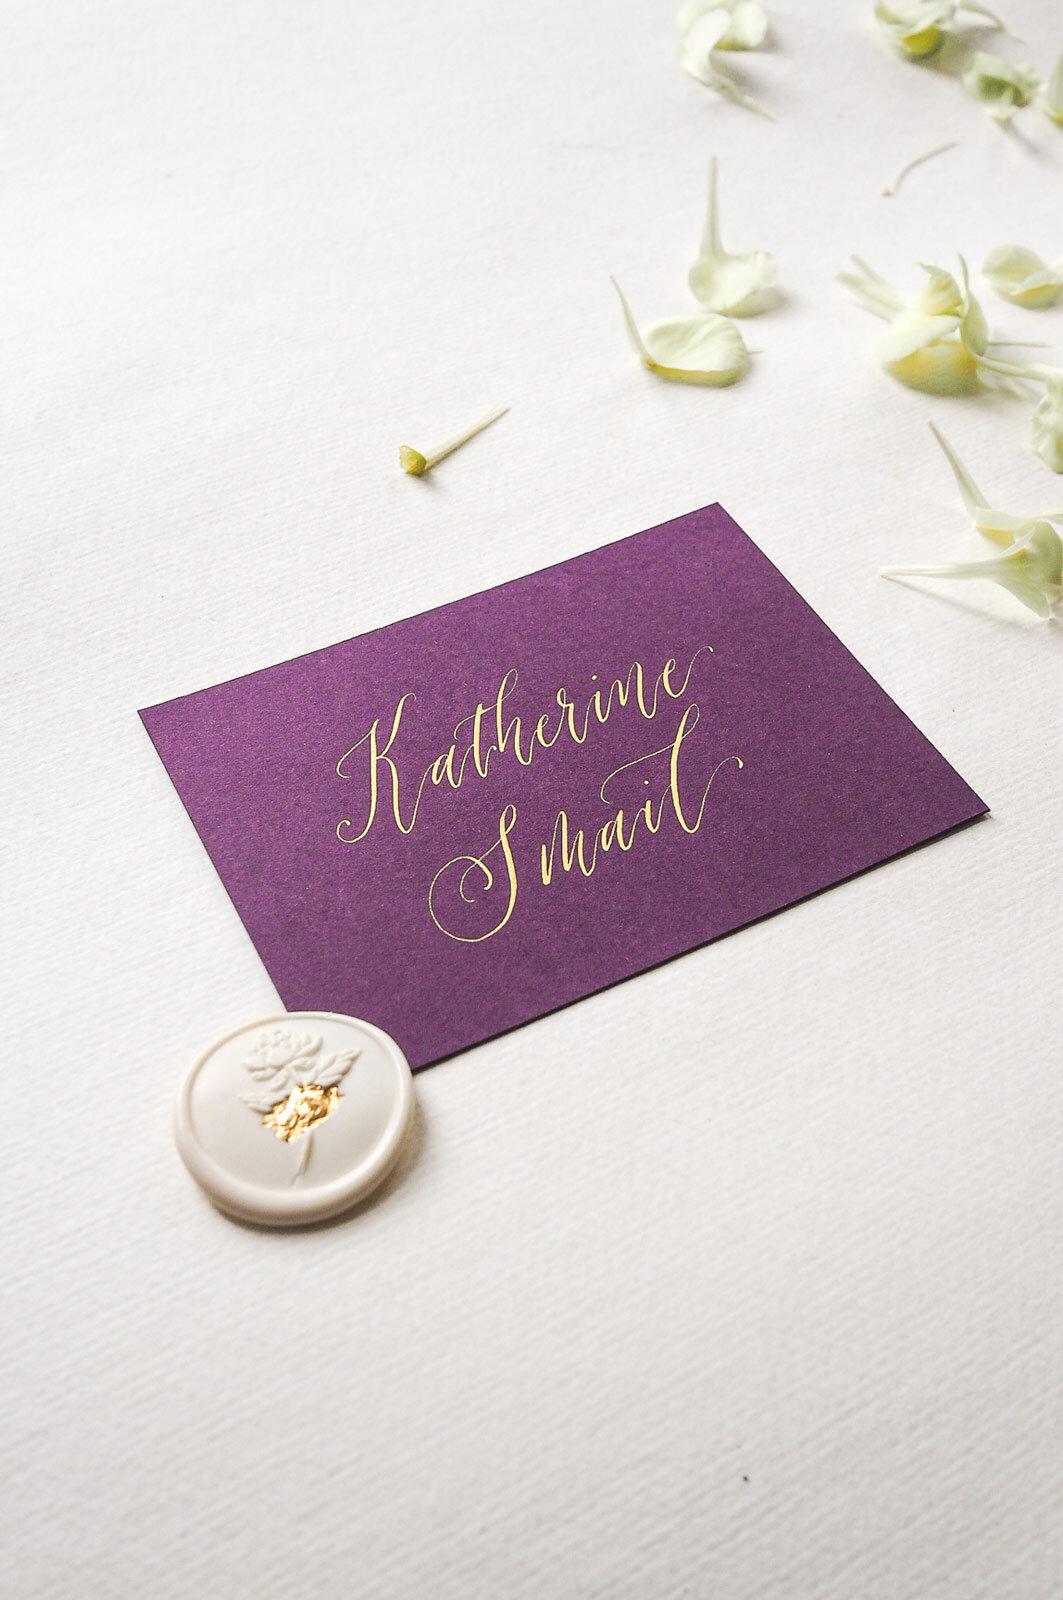 mathilda-lundin_calligraphy-style-1-bohemian-elegance.jpg